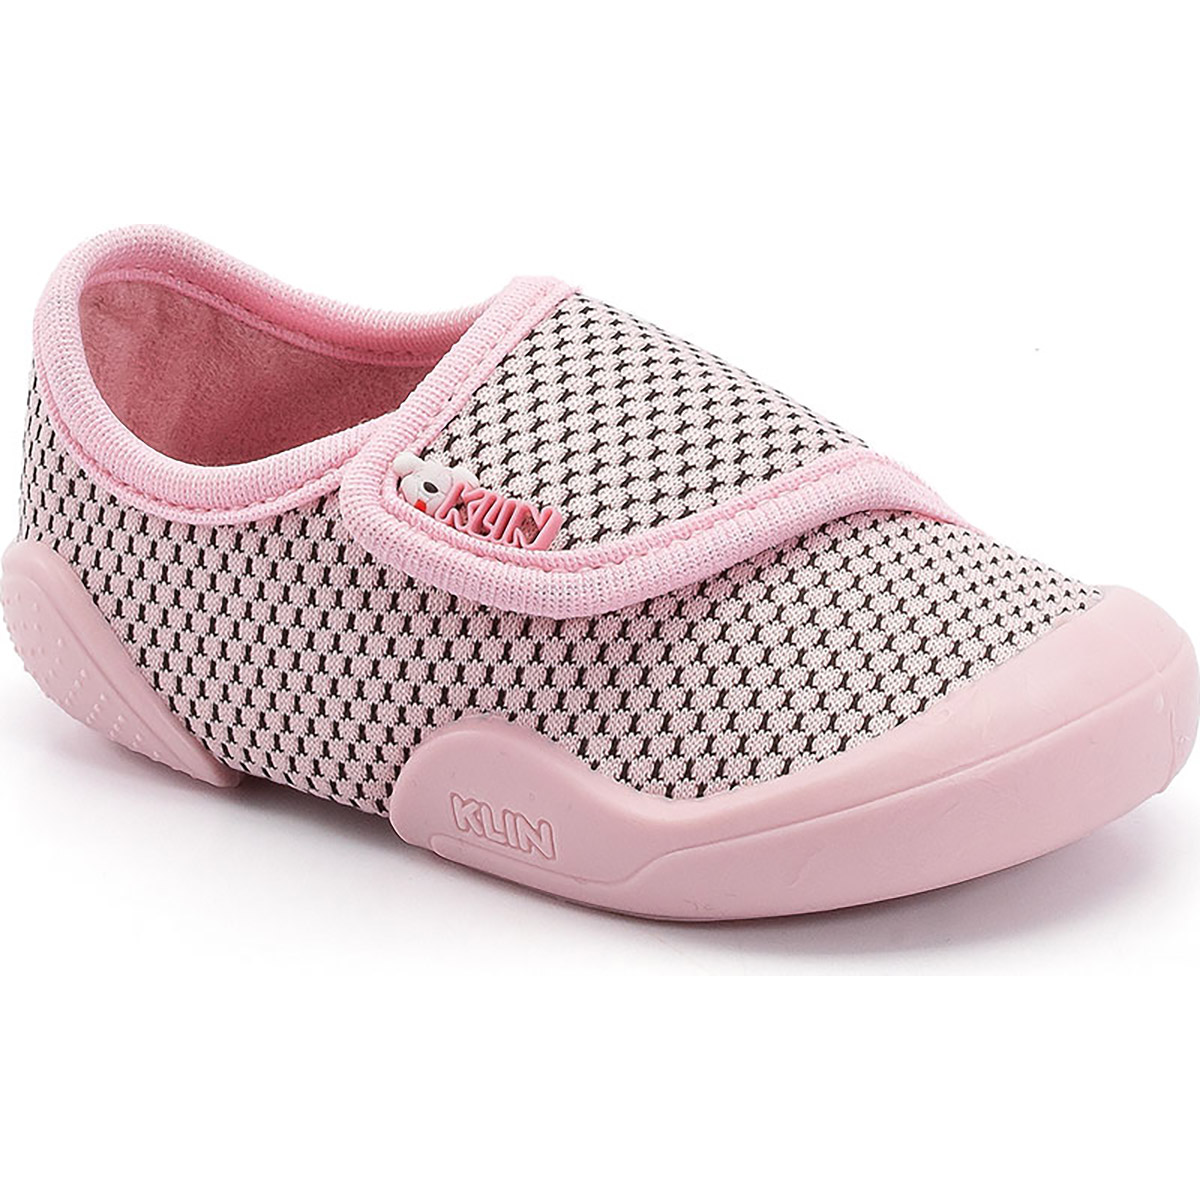 Sapato New Confort Klin Menina